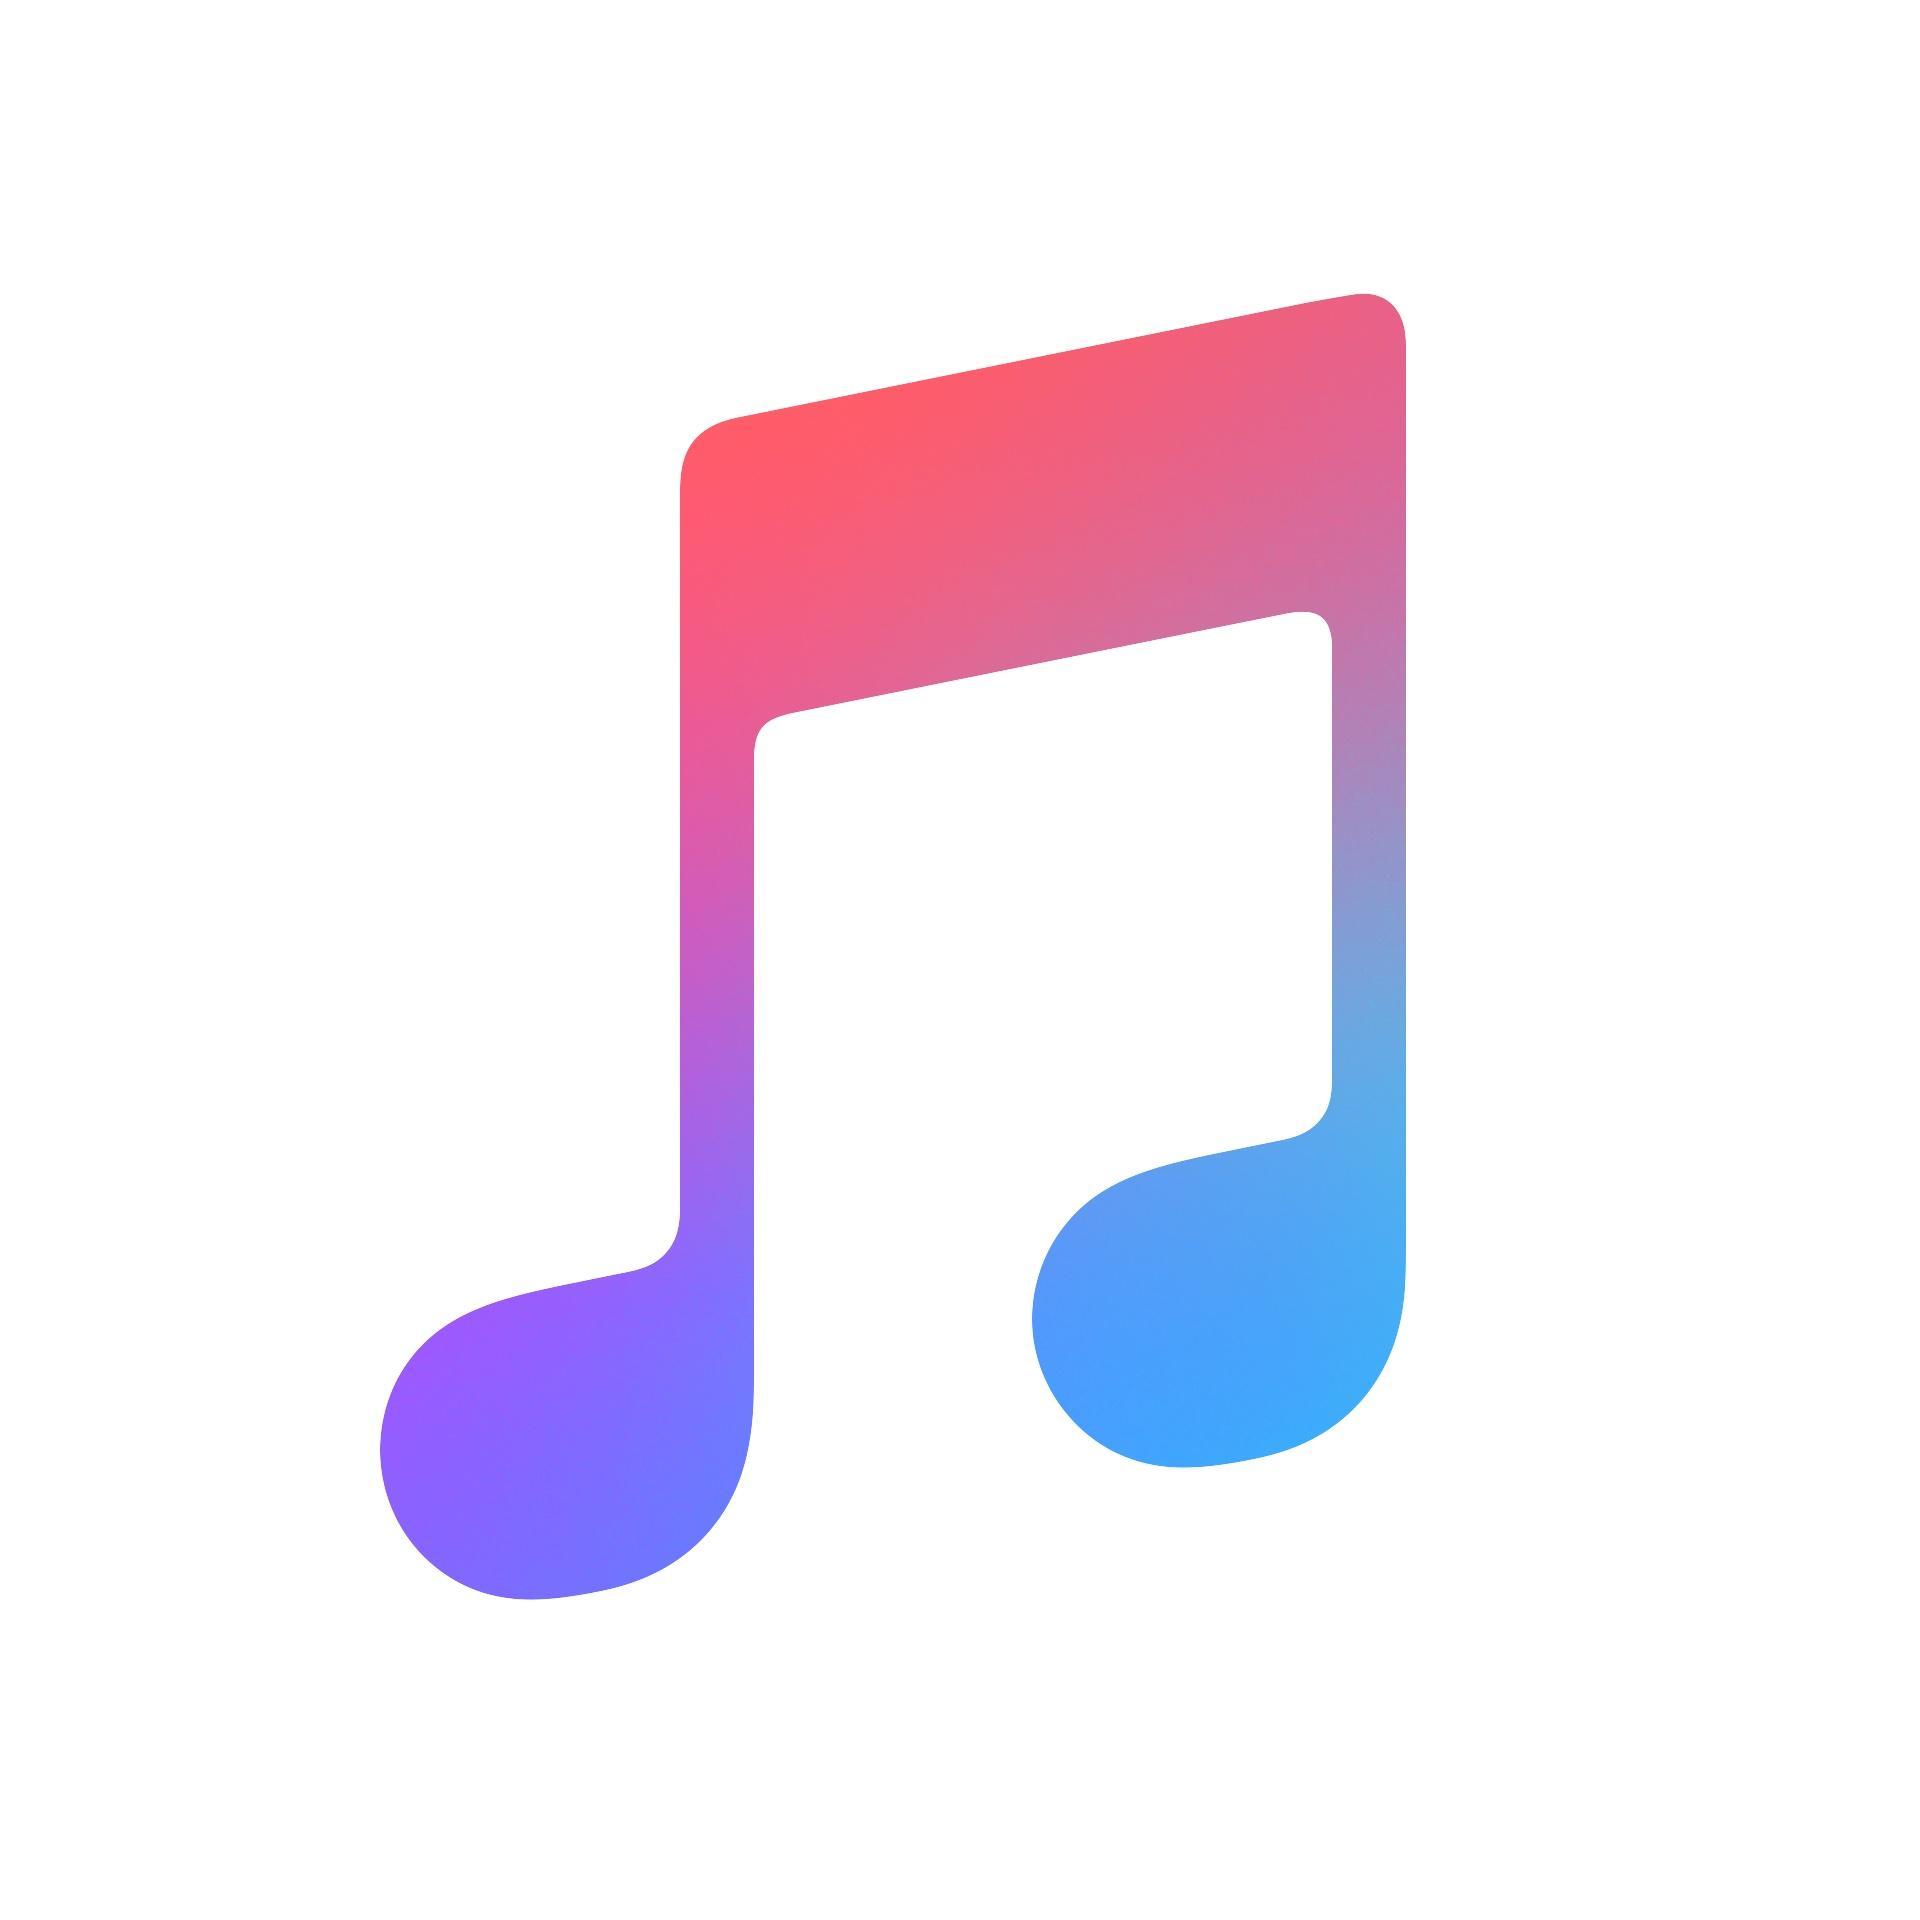 Apple_Music_Icon.jpg